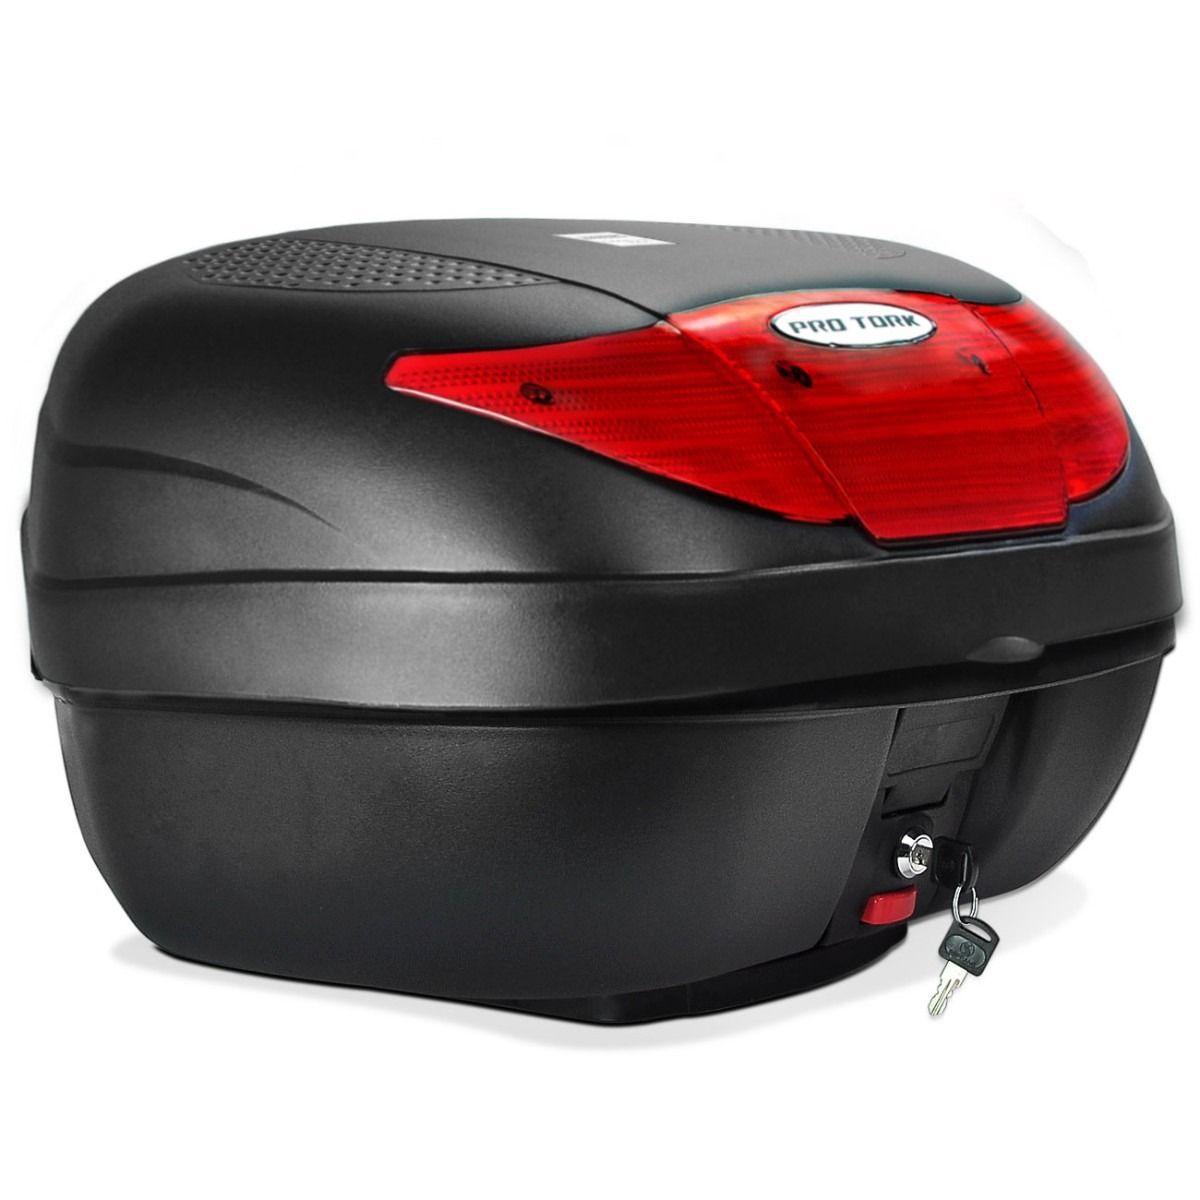 Bauleto 45L Smart Box Pro Tork